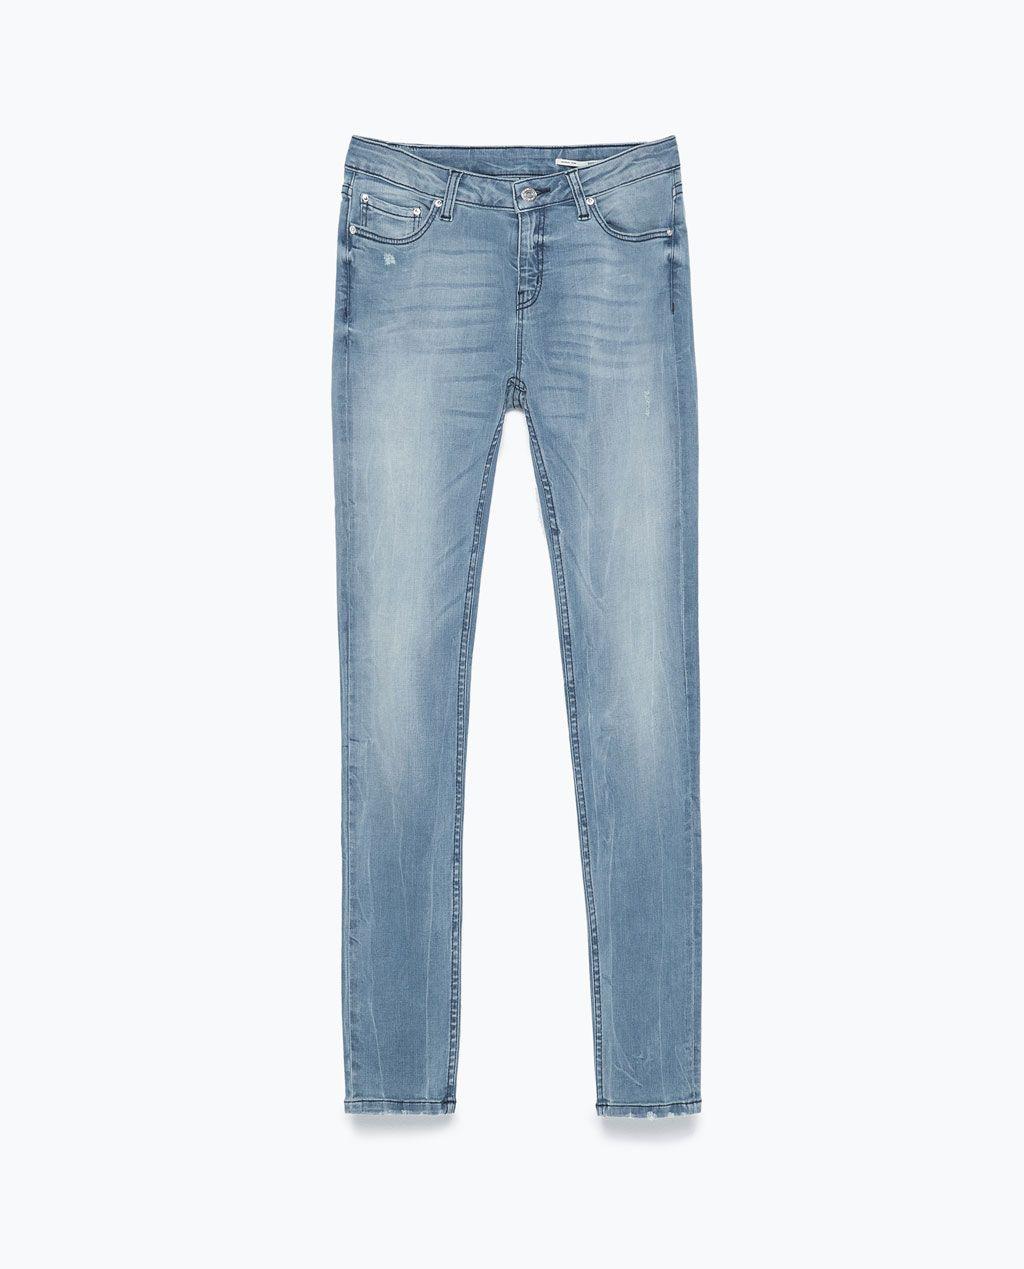 b27a06efcb SUPERSKINNY JEANS - Jeans - WOMAN   ZARA Czech Republic   ¸Z.A.R.A. ¸